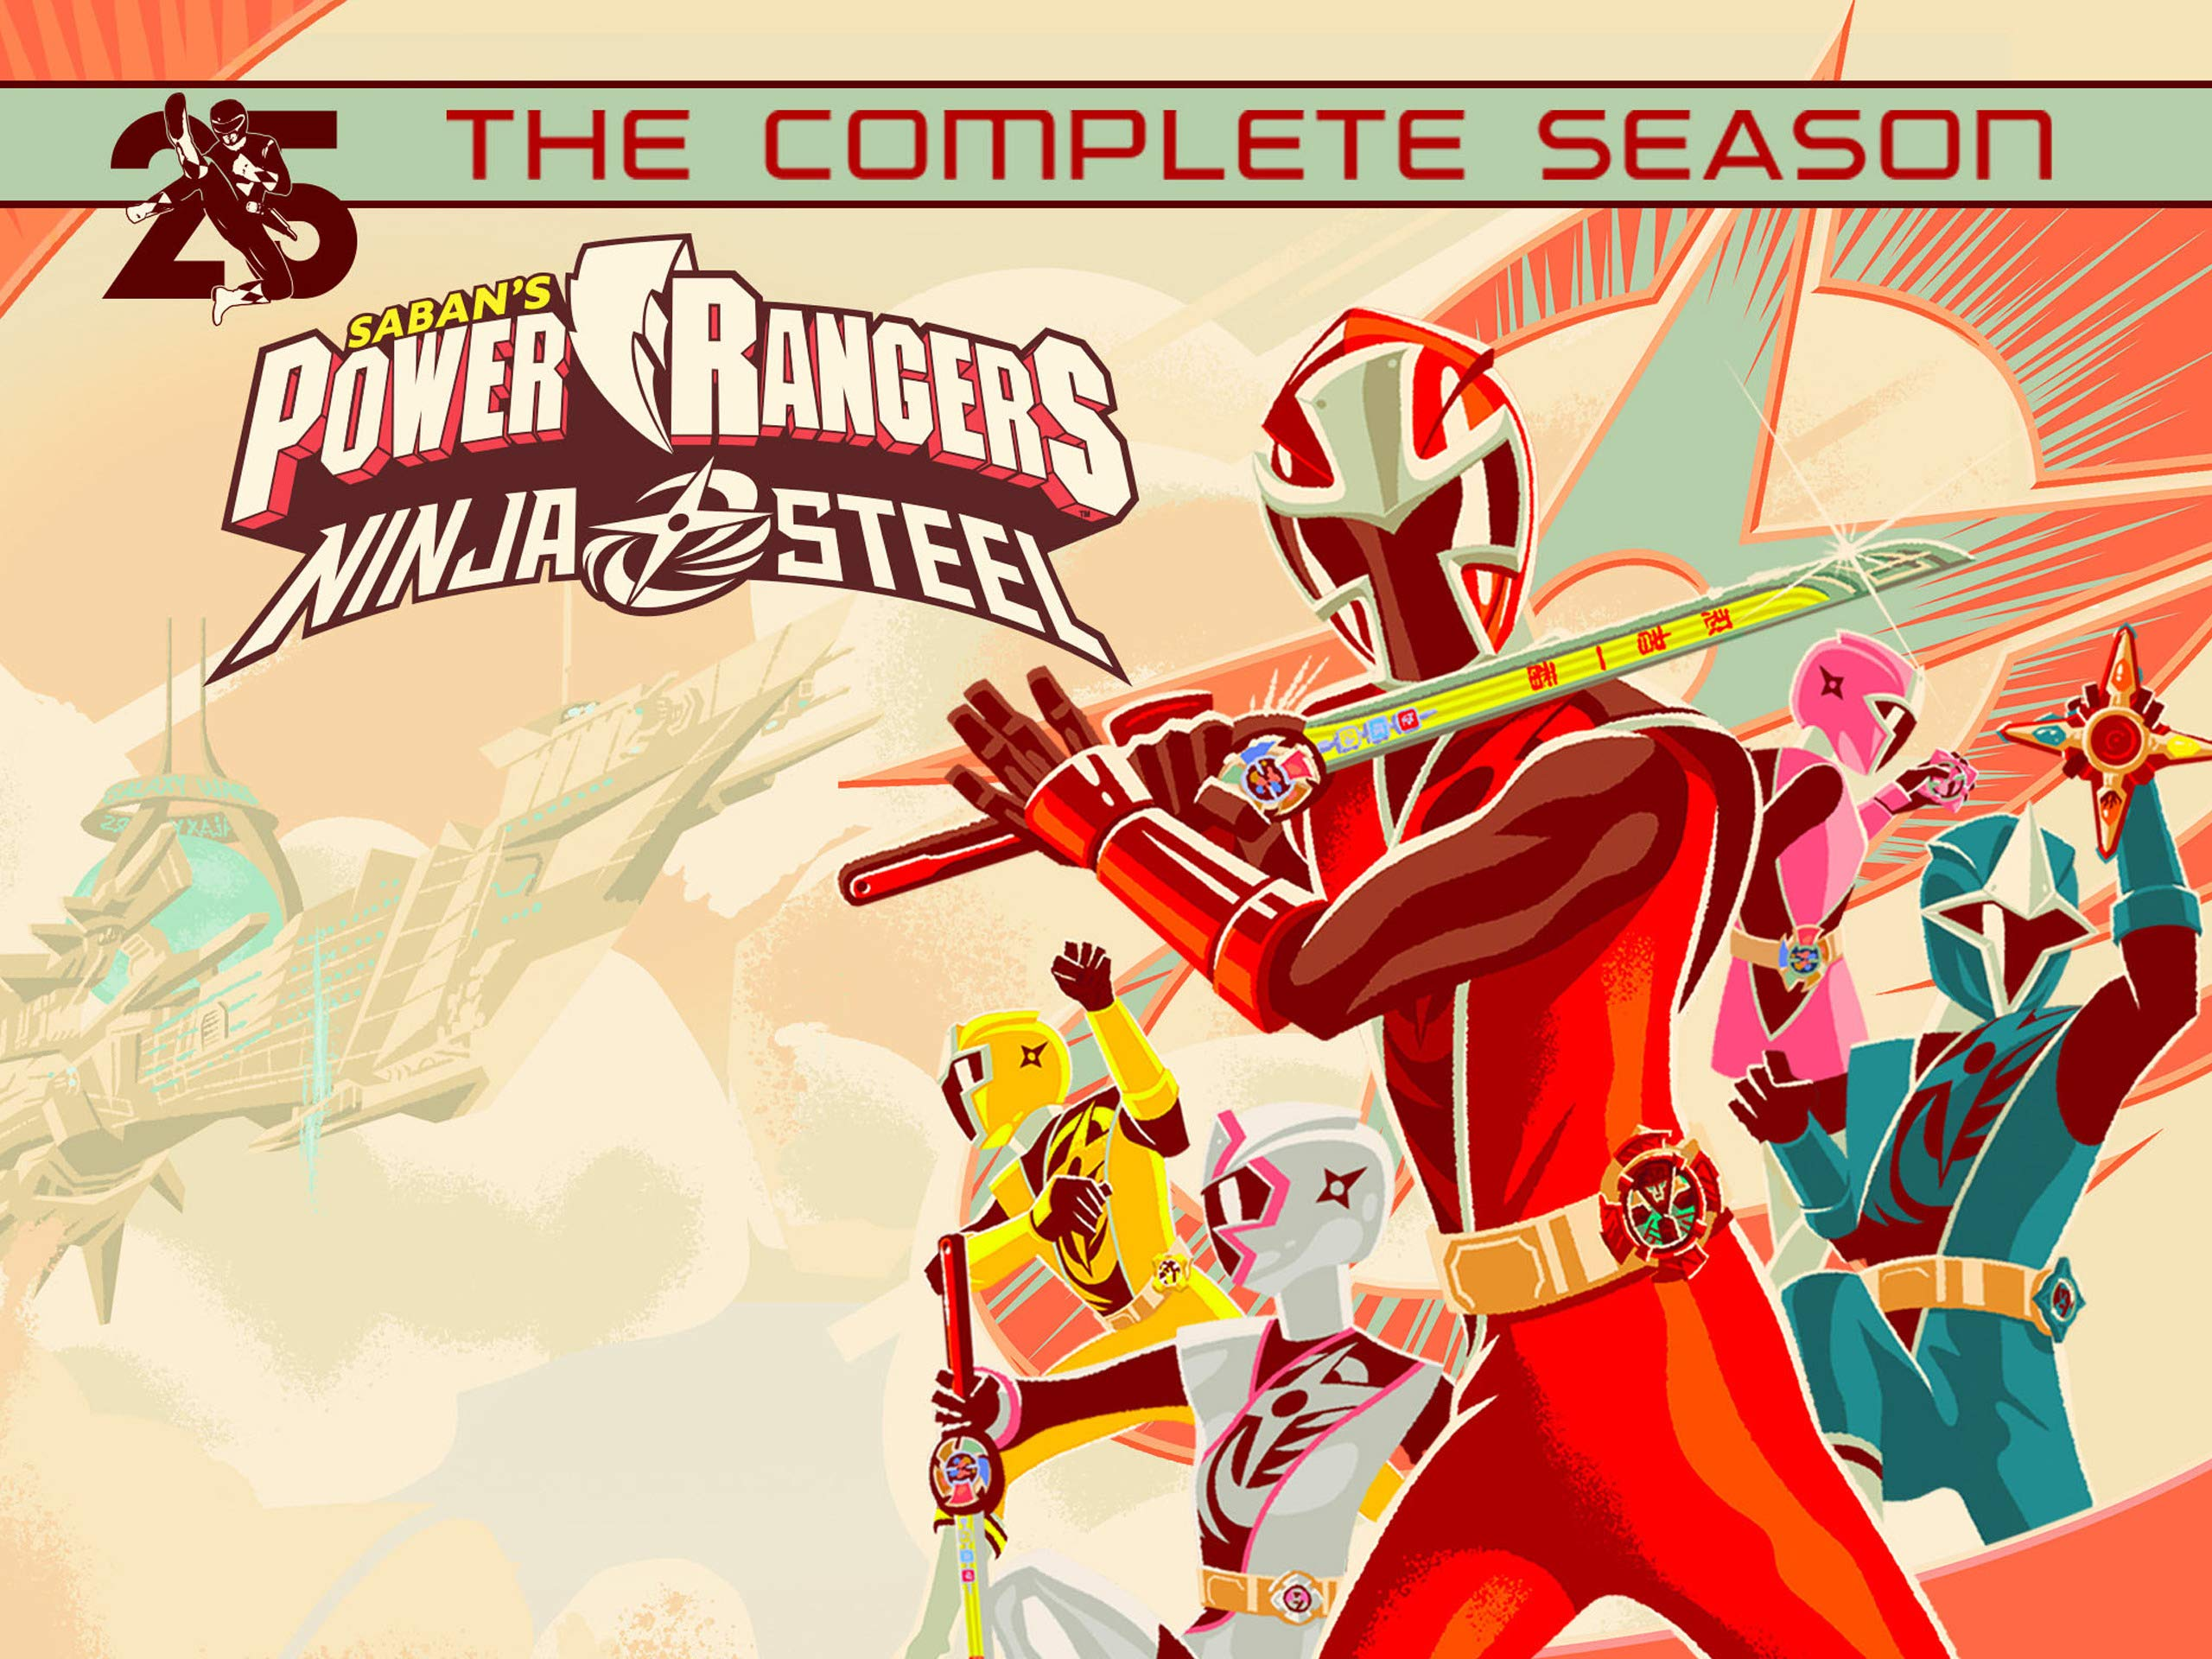 Amazon.com: Power Rangers Ninja Steel: The Complete Season